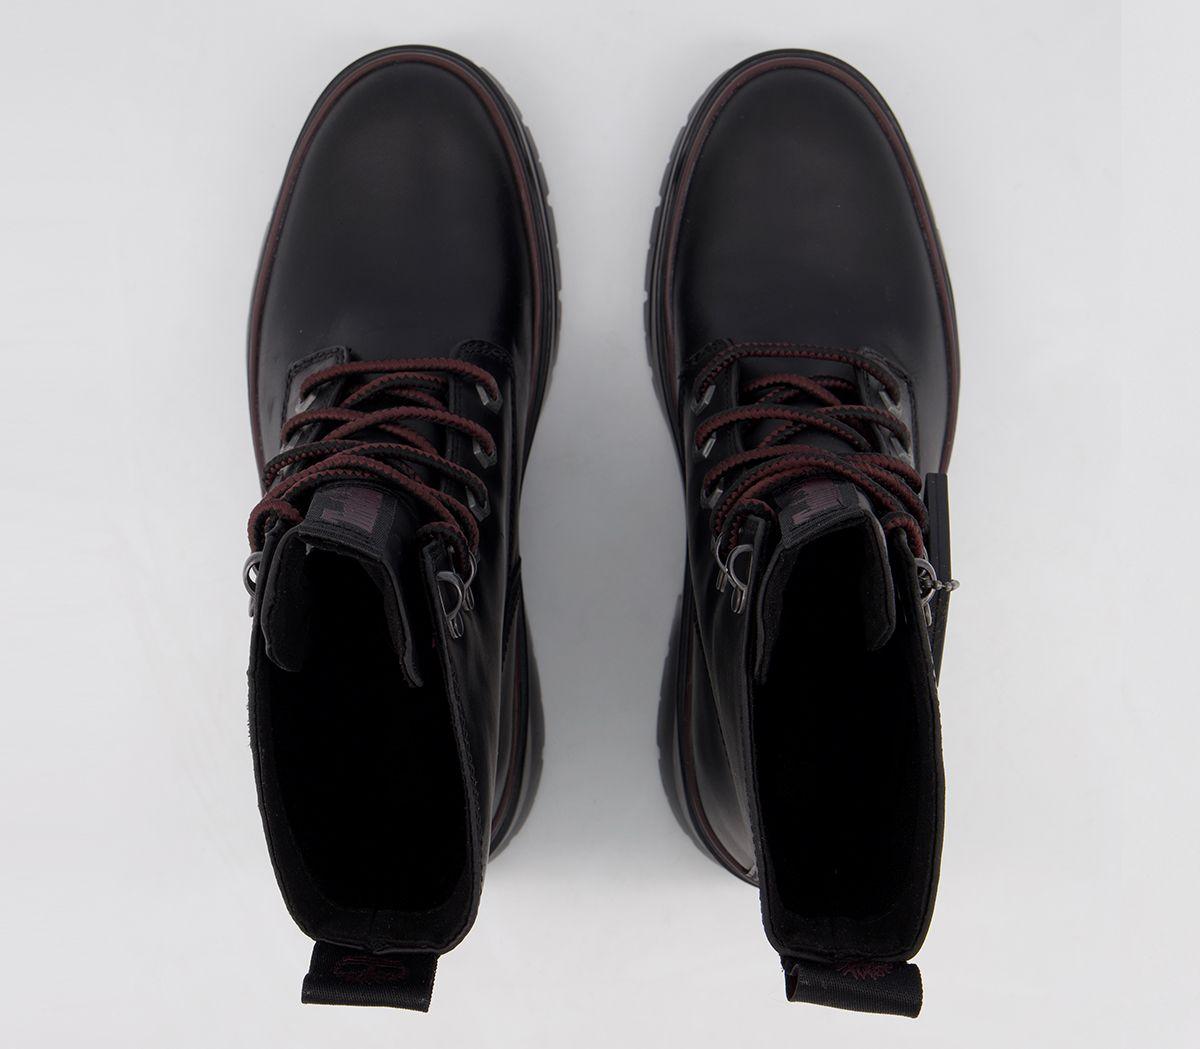 muerte misil Curso de colisión  Mujer Timberland Maylynn Impermeable Botas Cordones Botas Negras | eBay